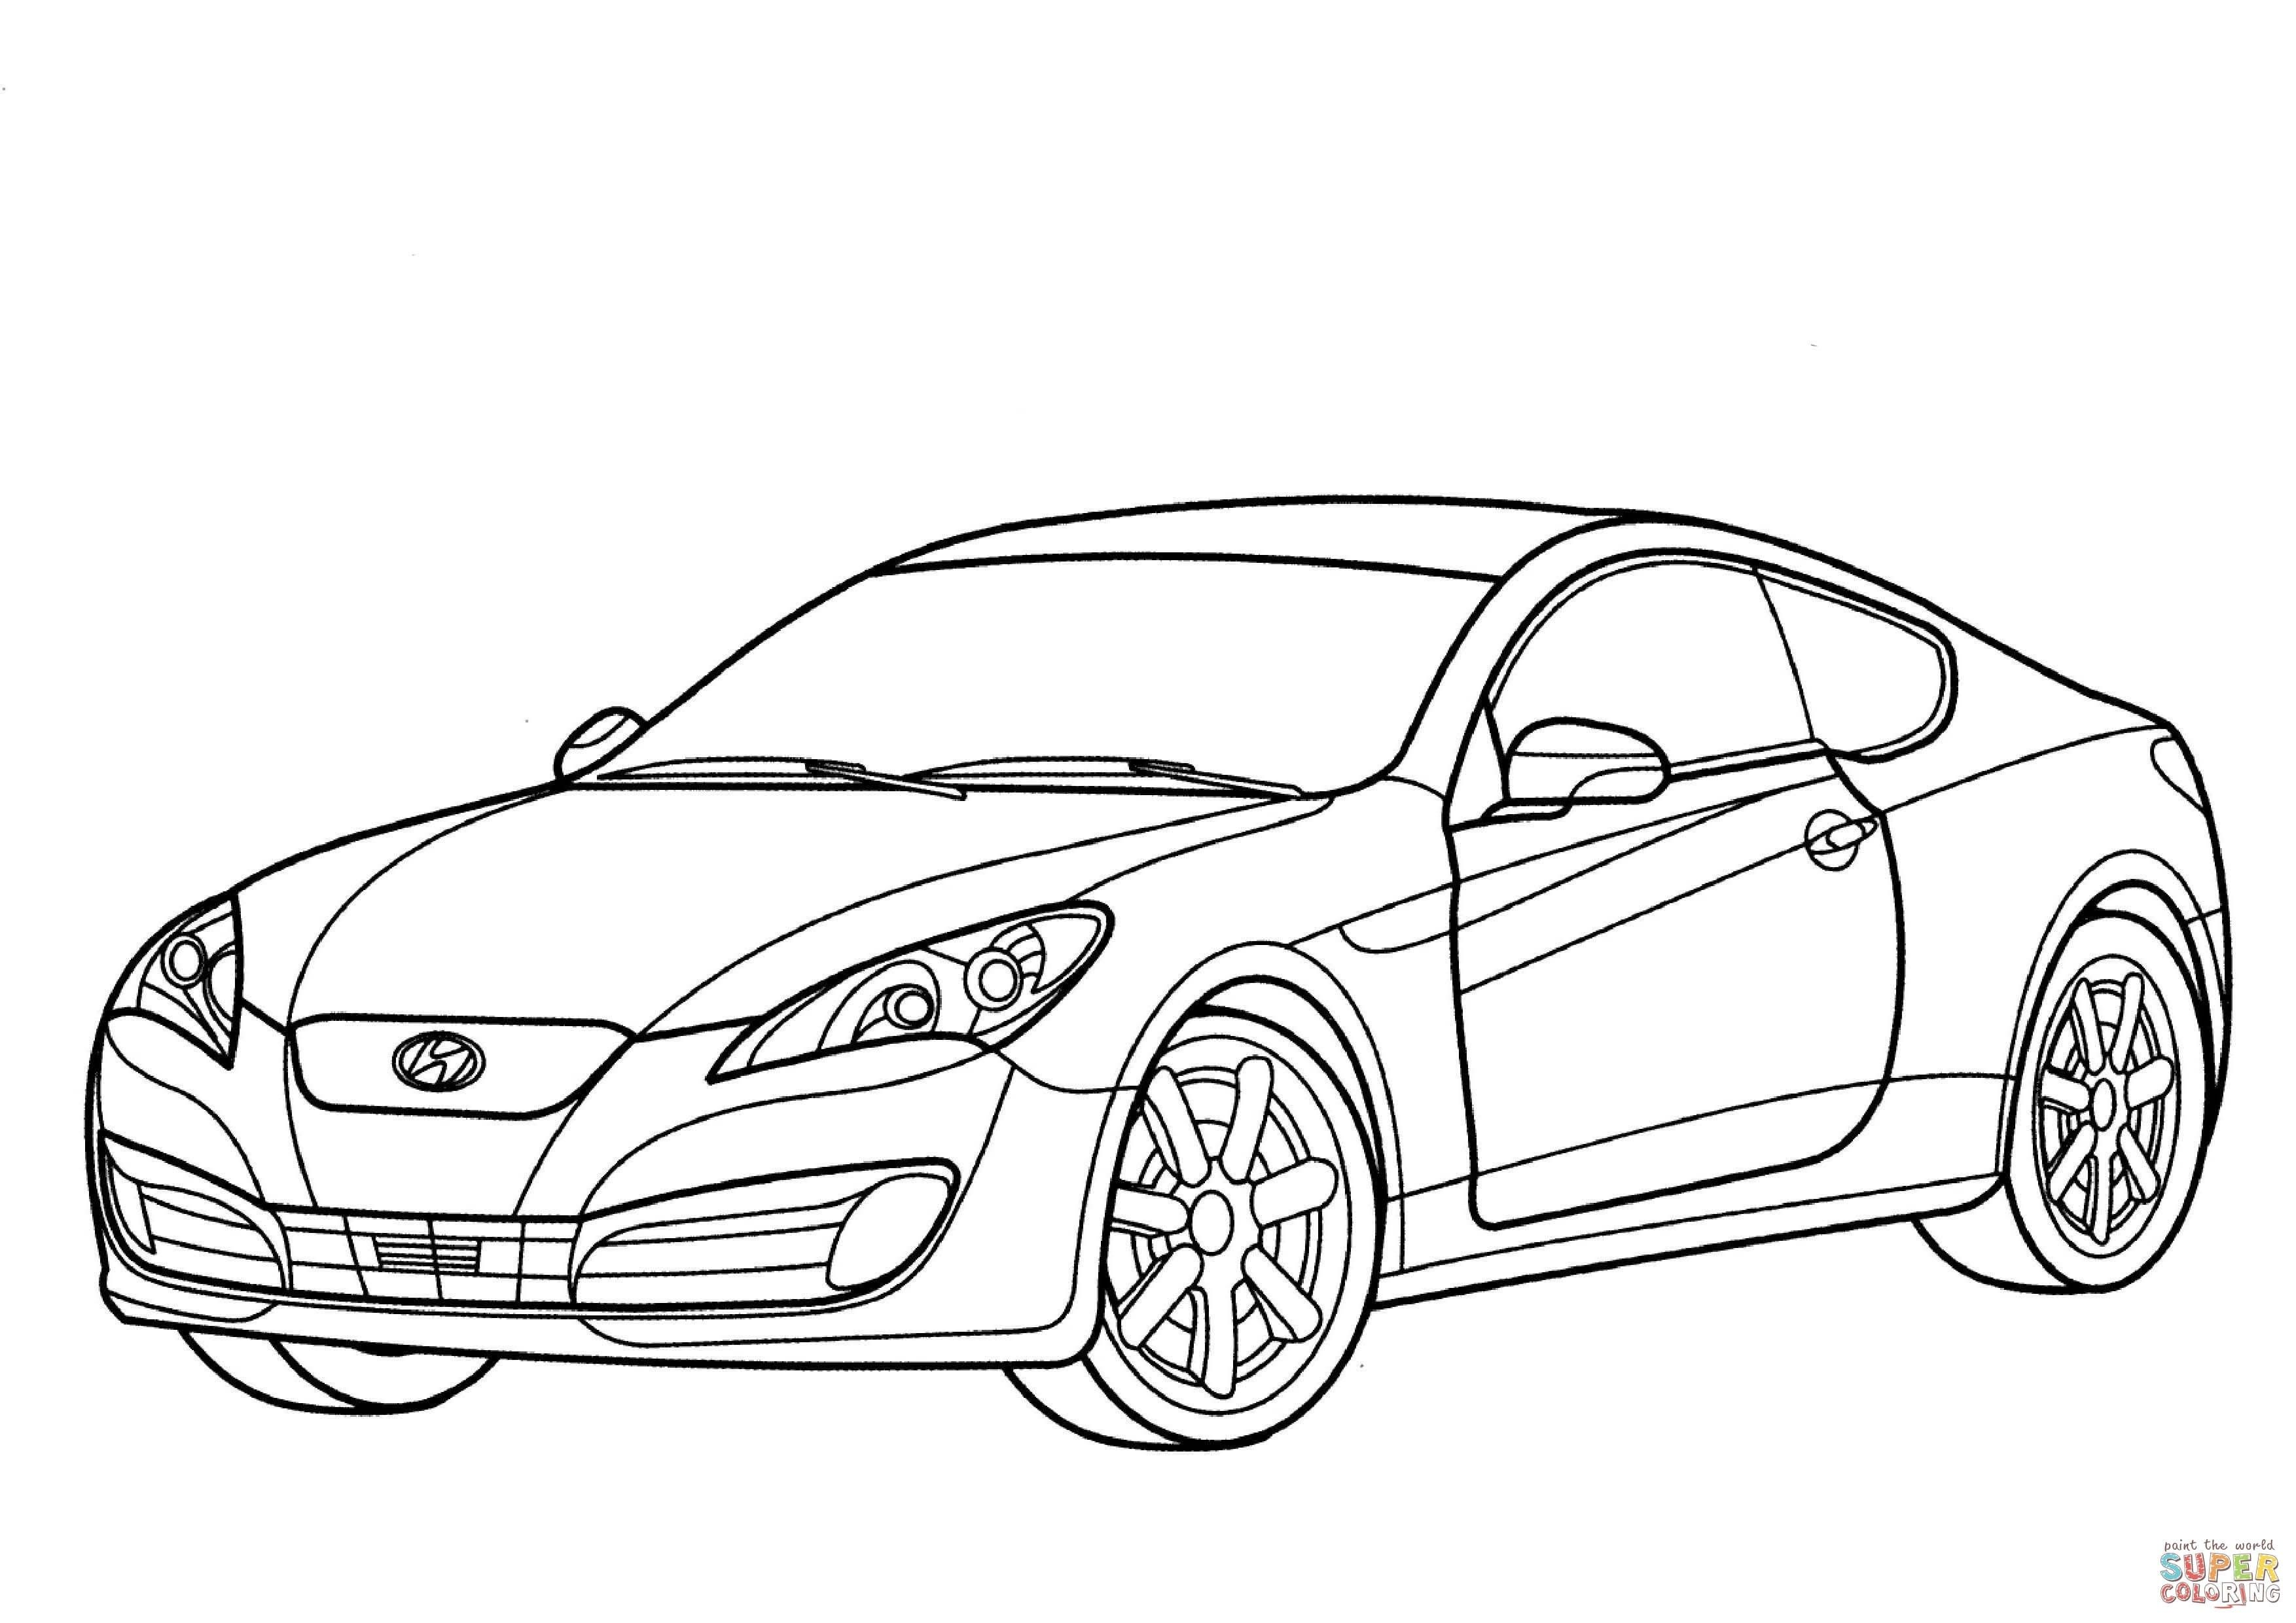 Hyundai Tiburon Coupe Coloring Pages Download